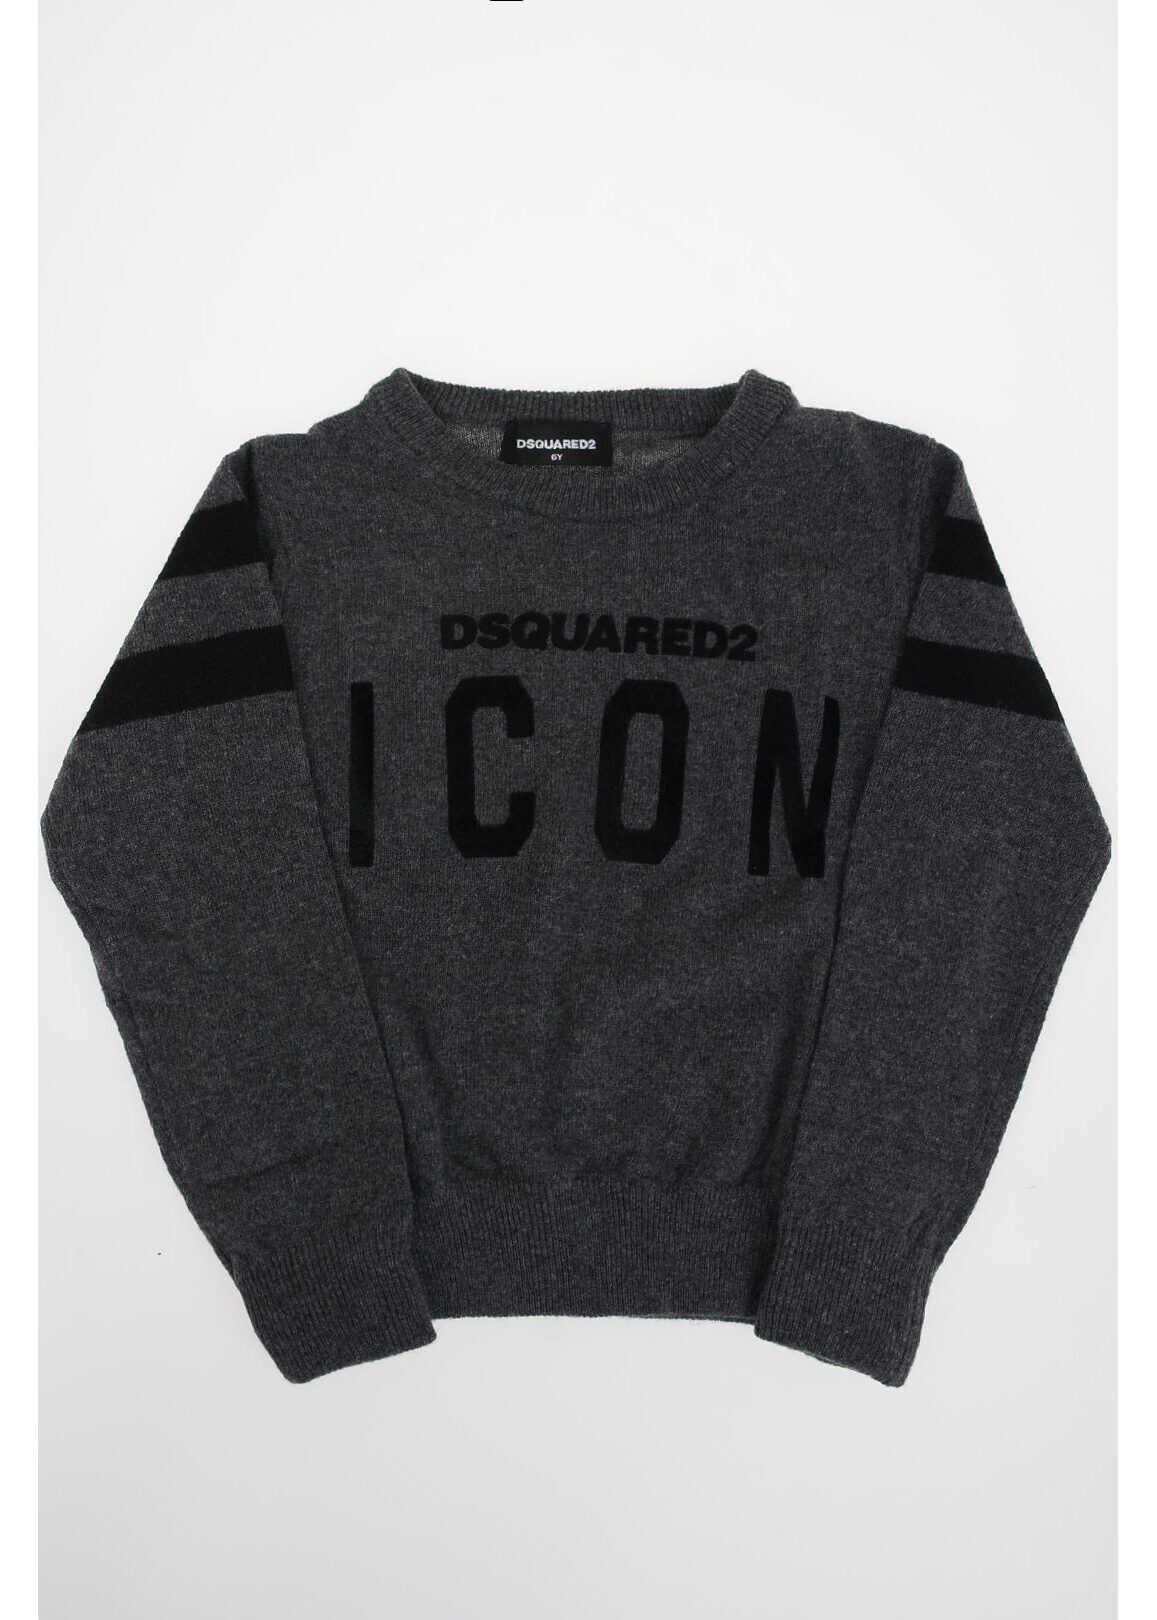 Dsquared2 Kids crew-neck ICON sweater GRAY